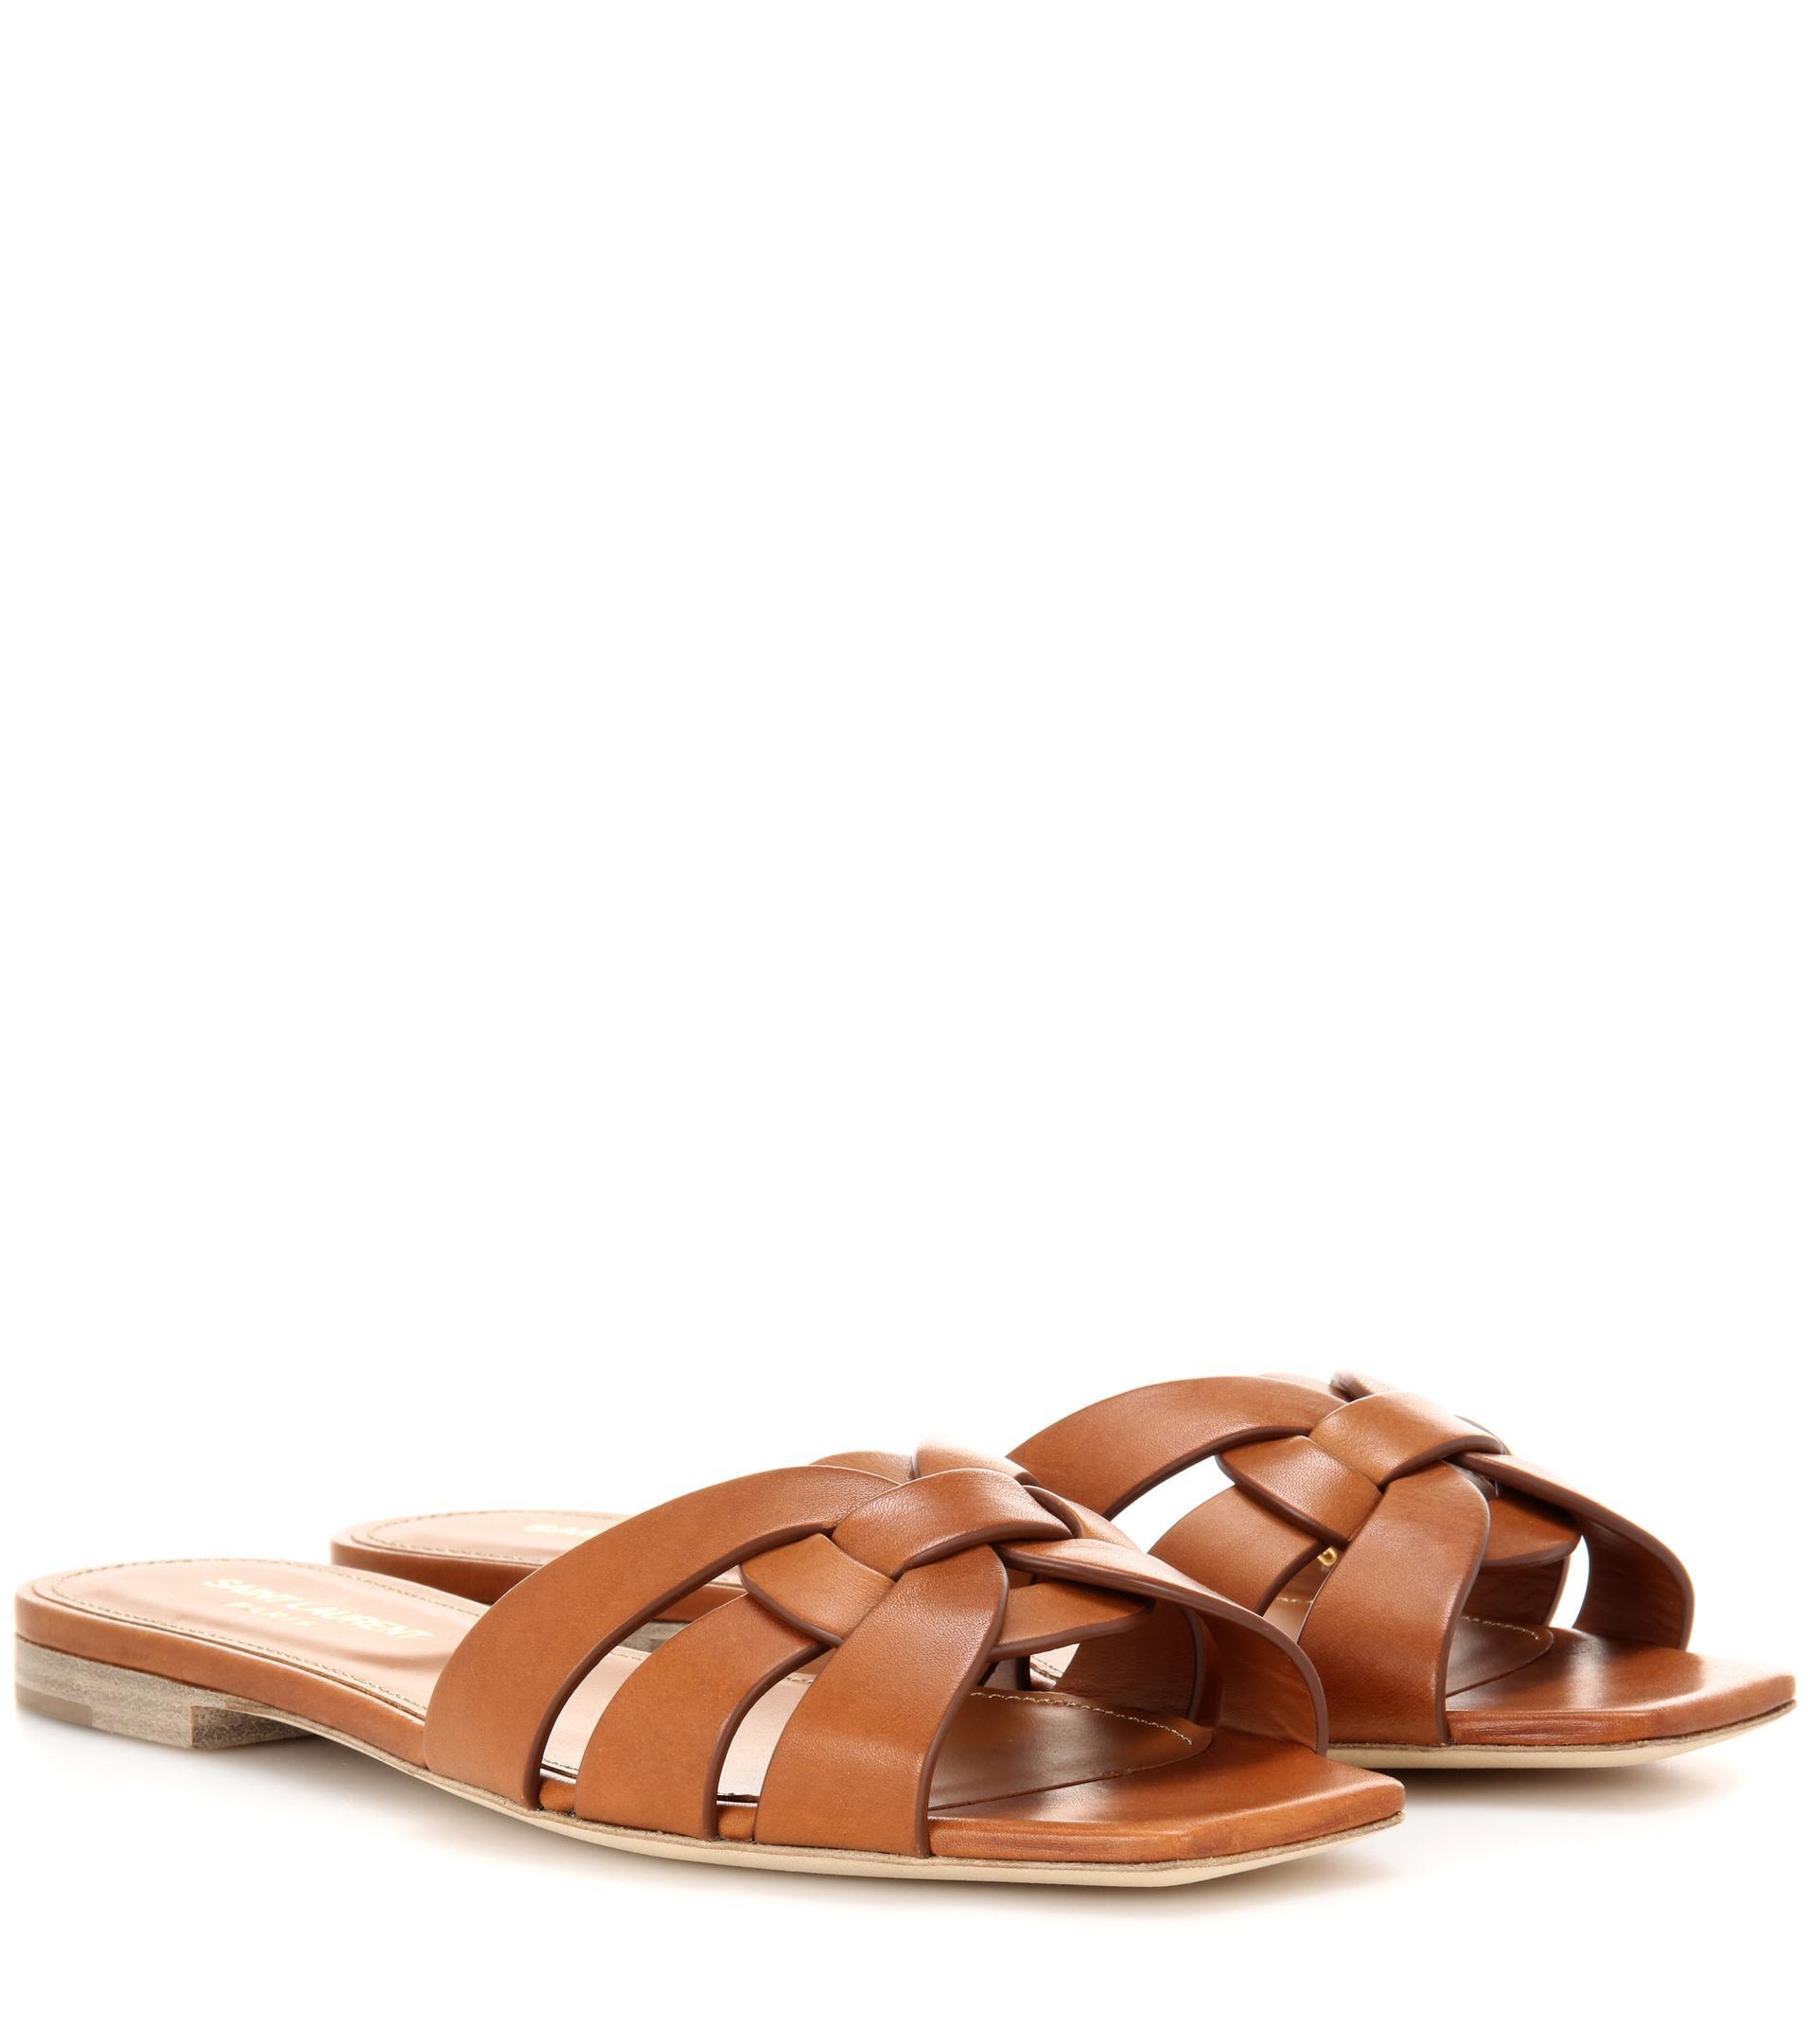 Nu Pieds 05 Leather Sandals Saint Laurent xJNmx